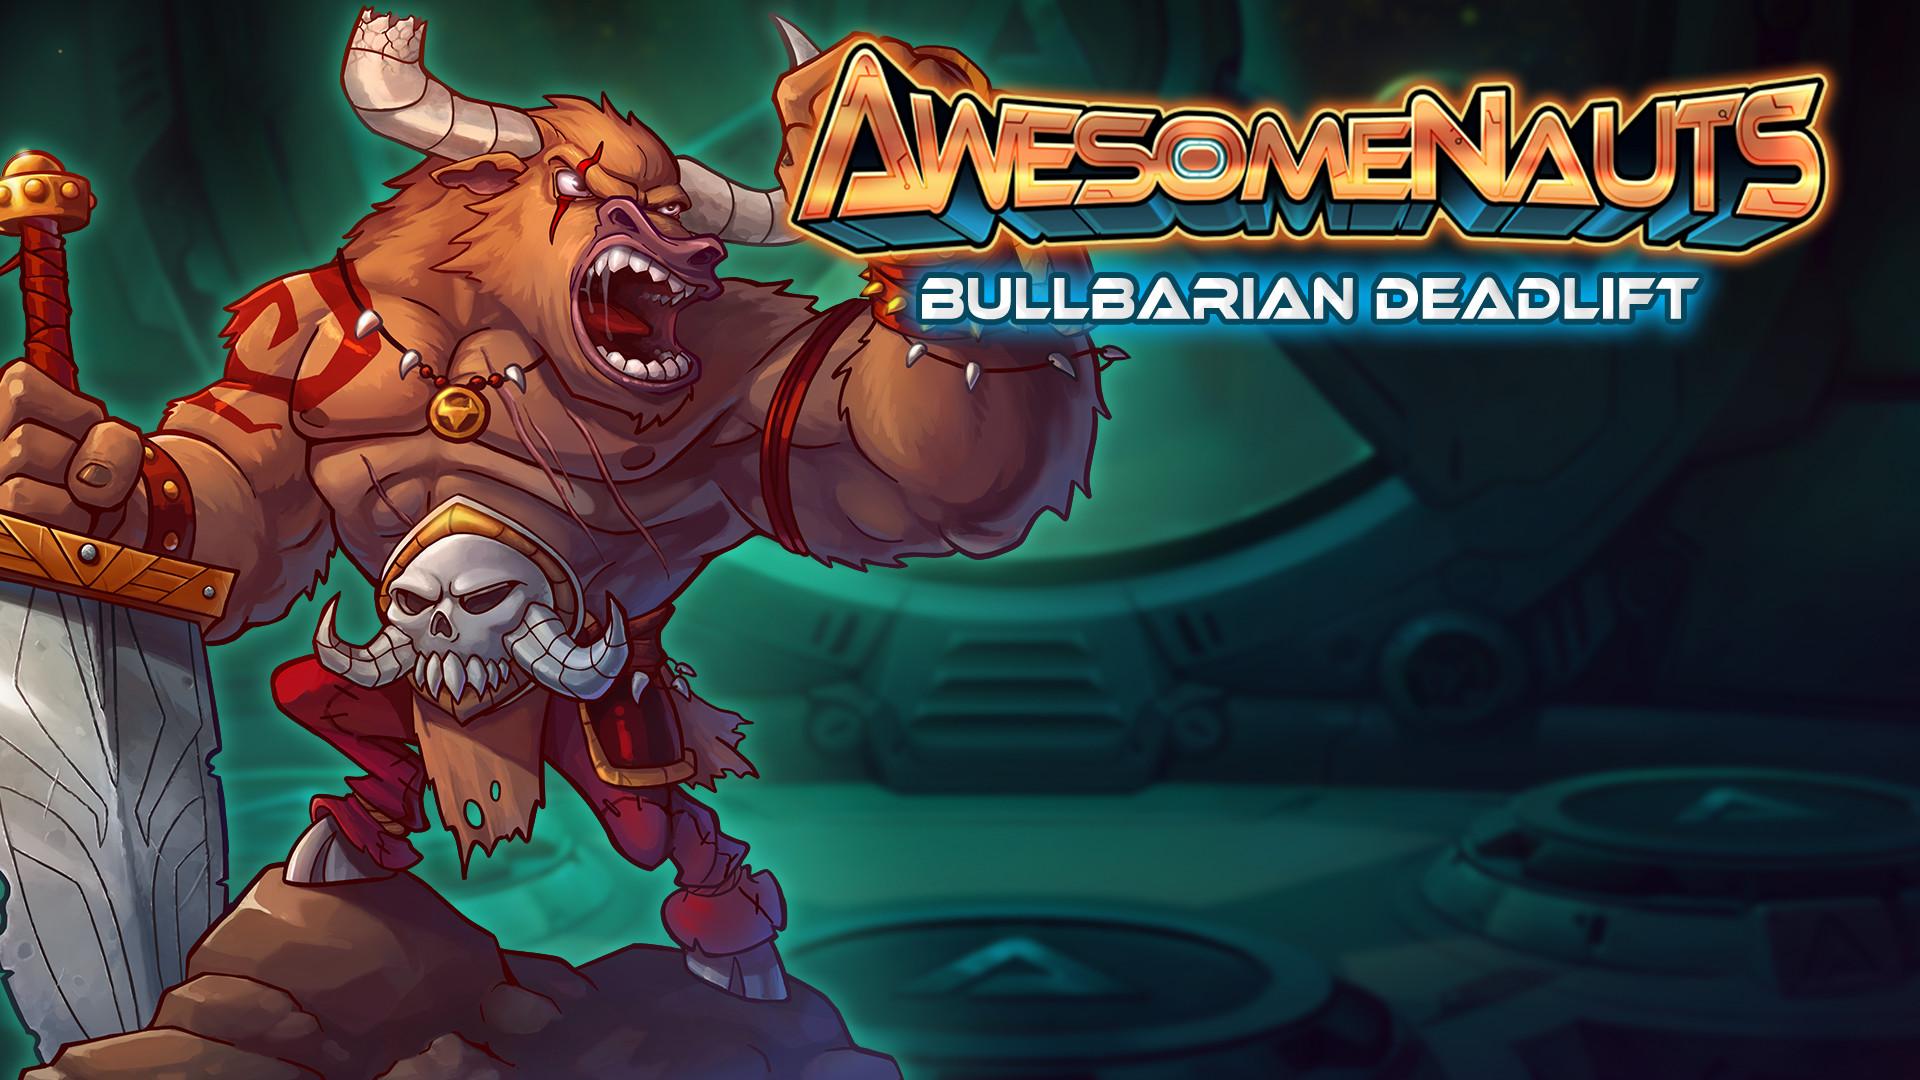 Awesomenauts - Bullbarian Deadlift Skin screenshot